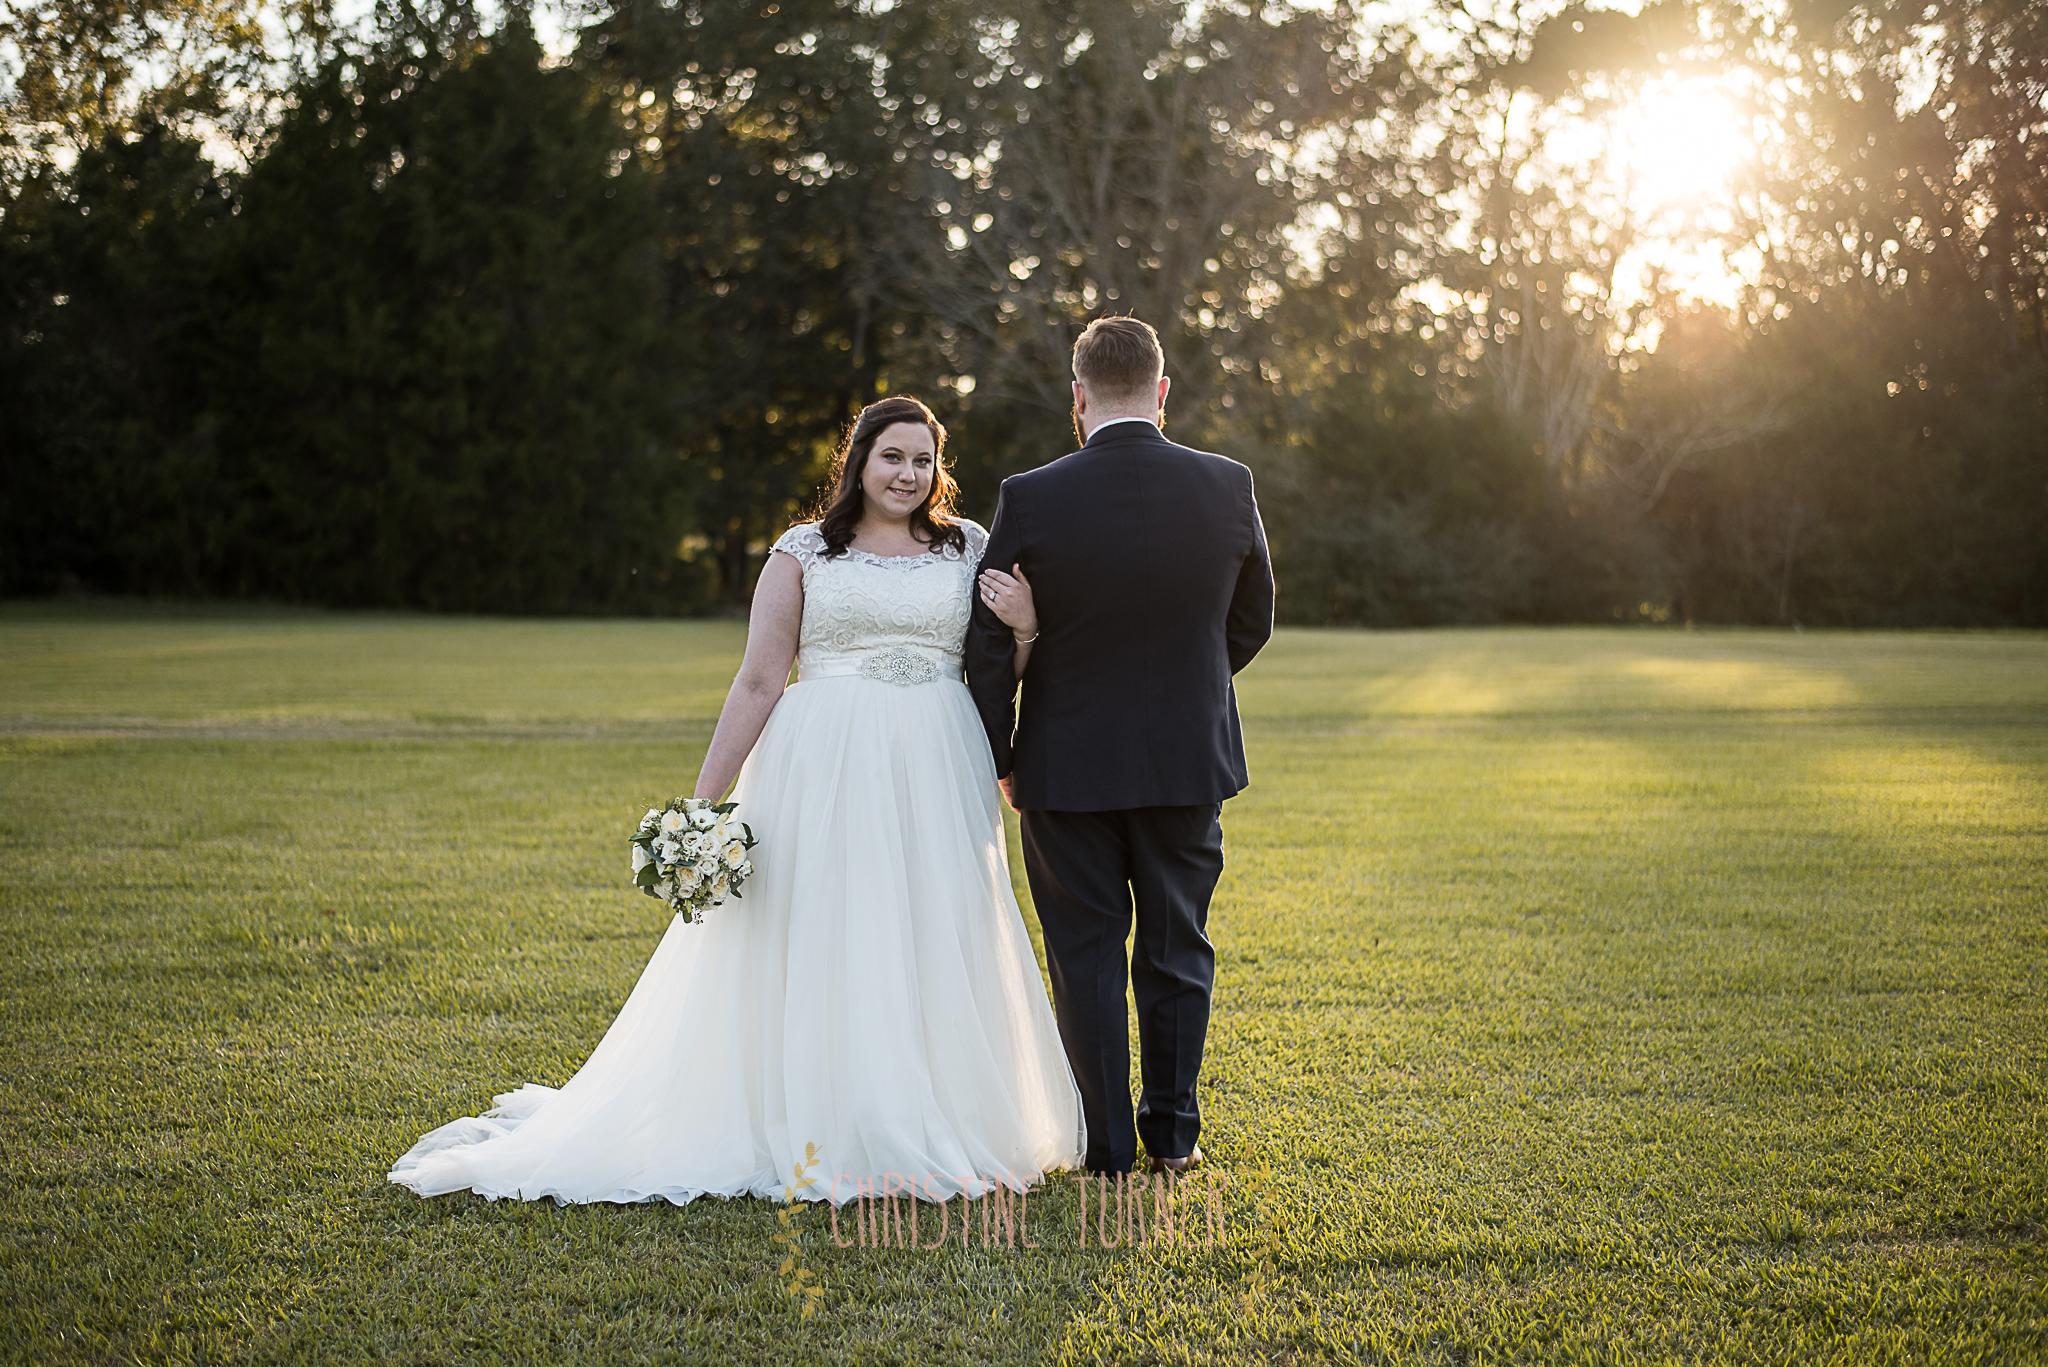 J&D Wedding (11 of 24)